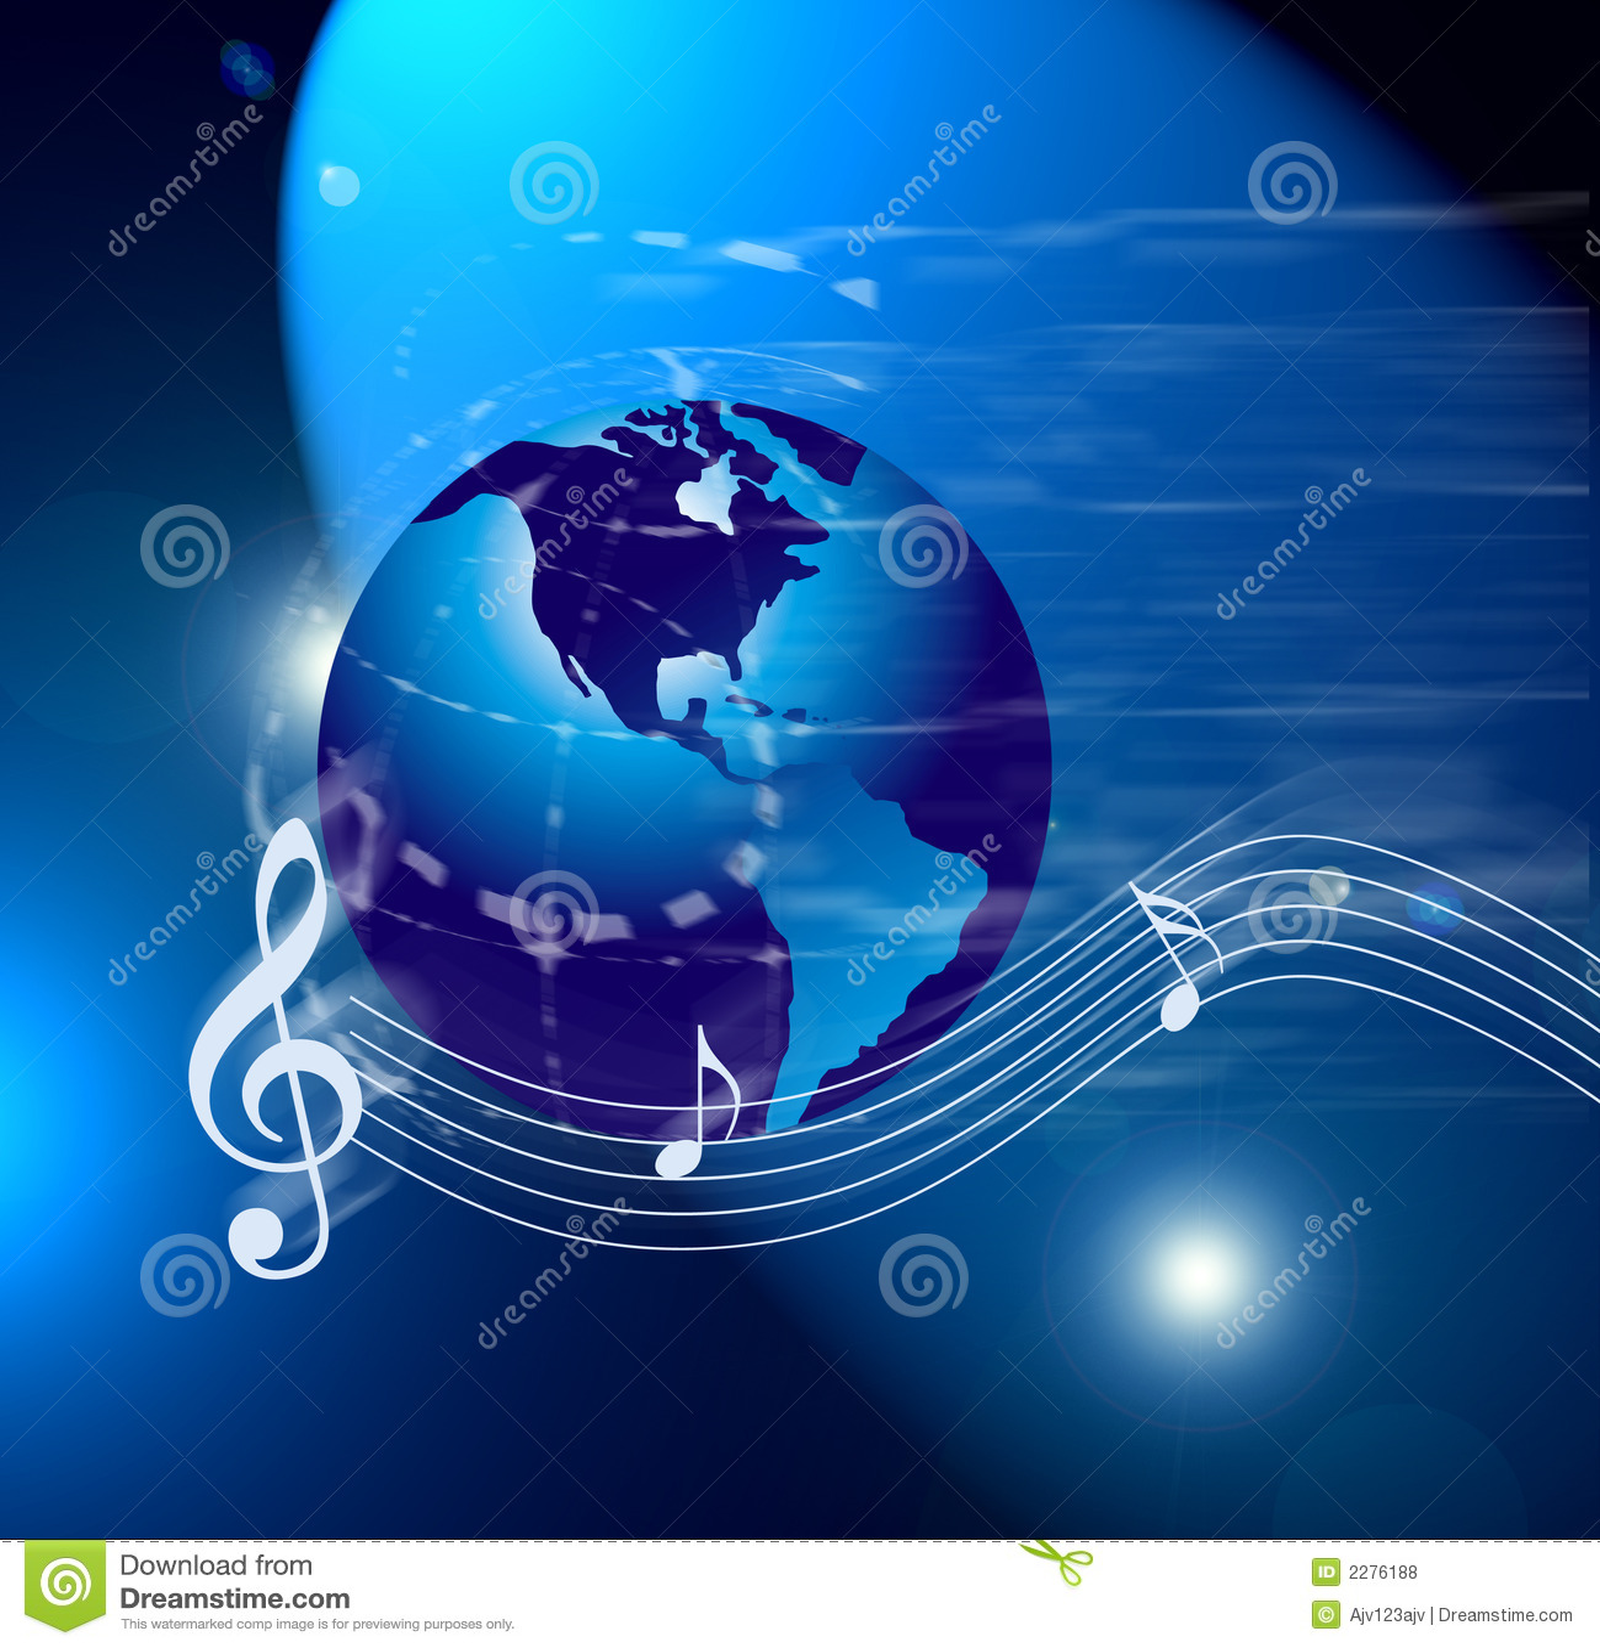 Internet Music World Notes Royalty Free Stock Photos - Image: 2276188